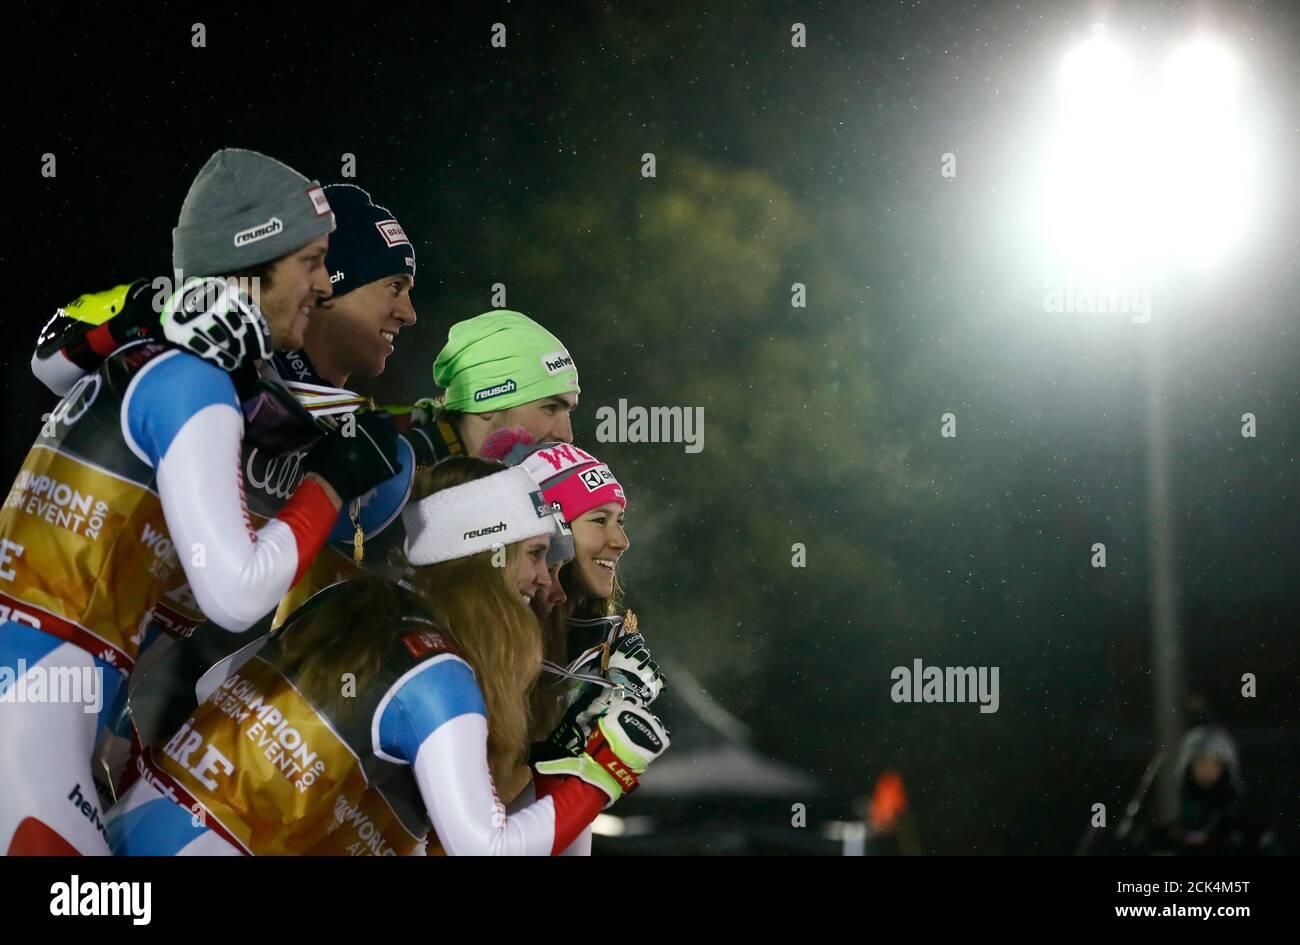 Alpine Skiing - FIS Alpine World Ski Championships - Mixed Alpine Team Event - Are, Sweden - February 12, 2019 - Gold medalists Switzerland's Aline Danioth, Andrea Ellenberger, Wendy Holdener, Sandro Simonet, Daniel Yule and Ramon Zenhaeusern pose with their medals. REUTERS/Christian Hartmann Stock Photo